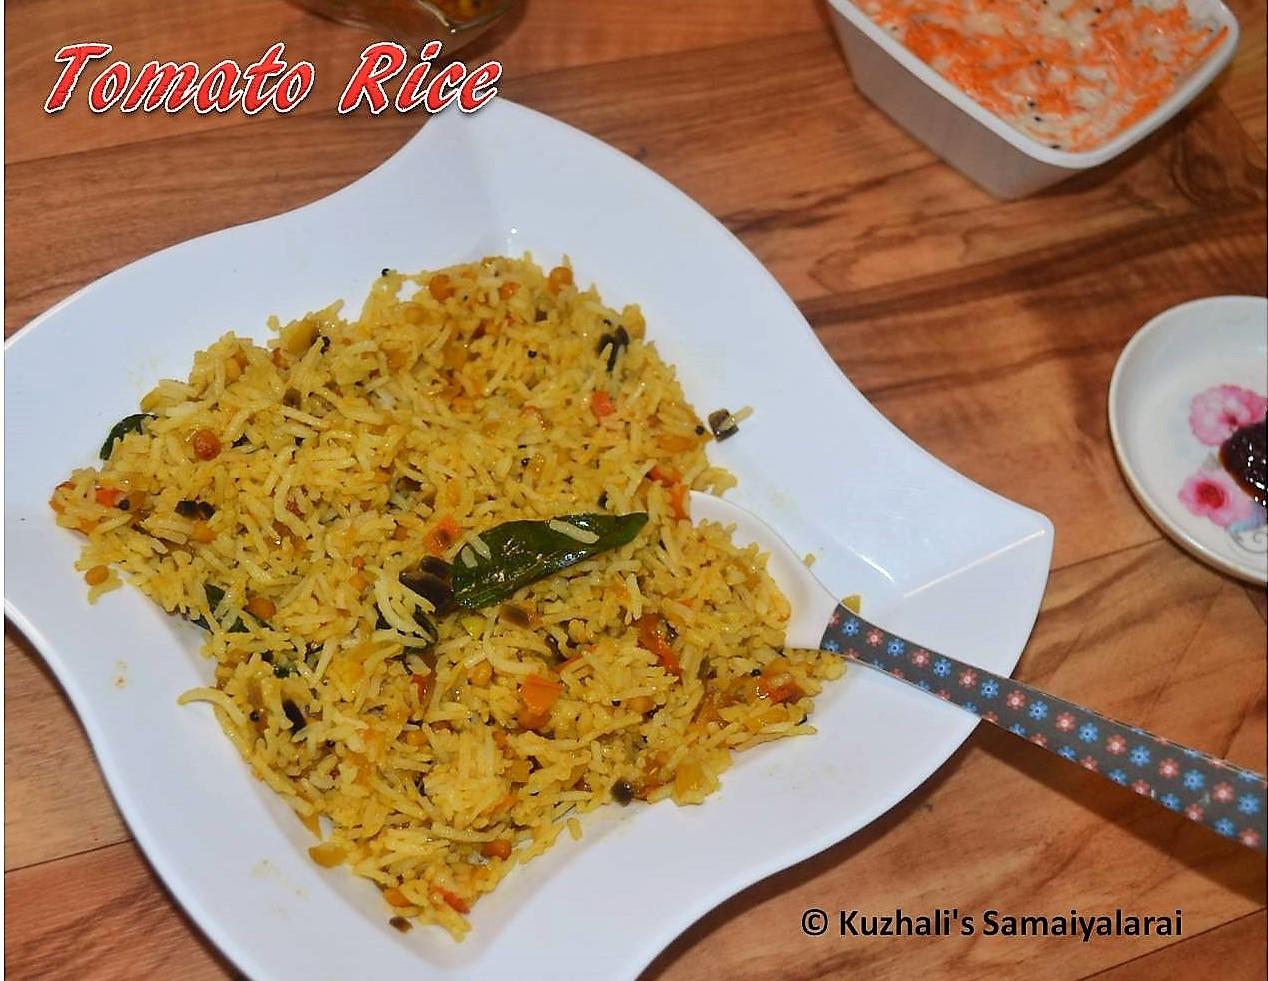 Kuzhalis samaiyalarai tomato rice south indian tomato rice tomato rice south indian tomato ricethakkali satham recipe variety rice recipes forumfinder Gallery